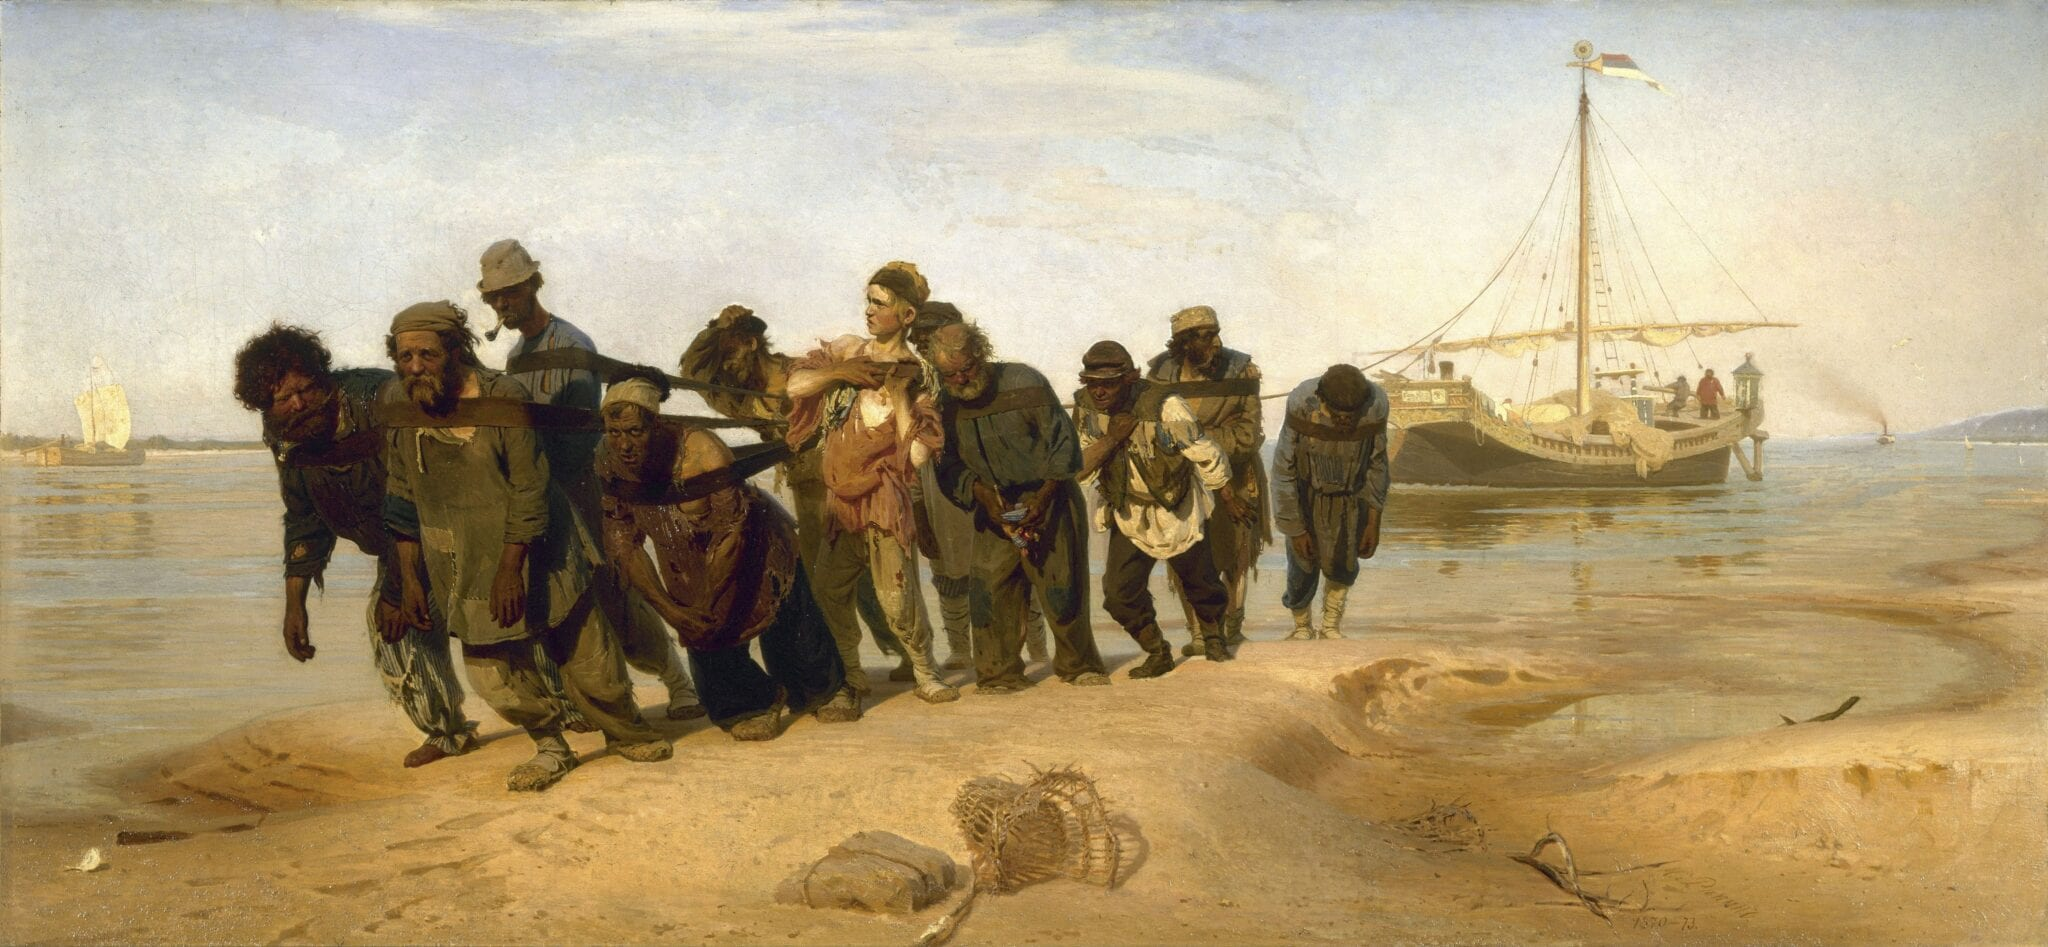 Reproduction of The Volga Boatmen